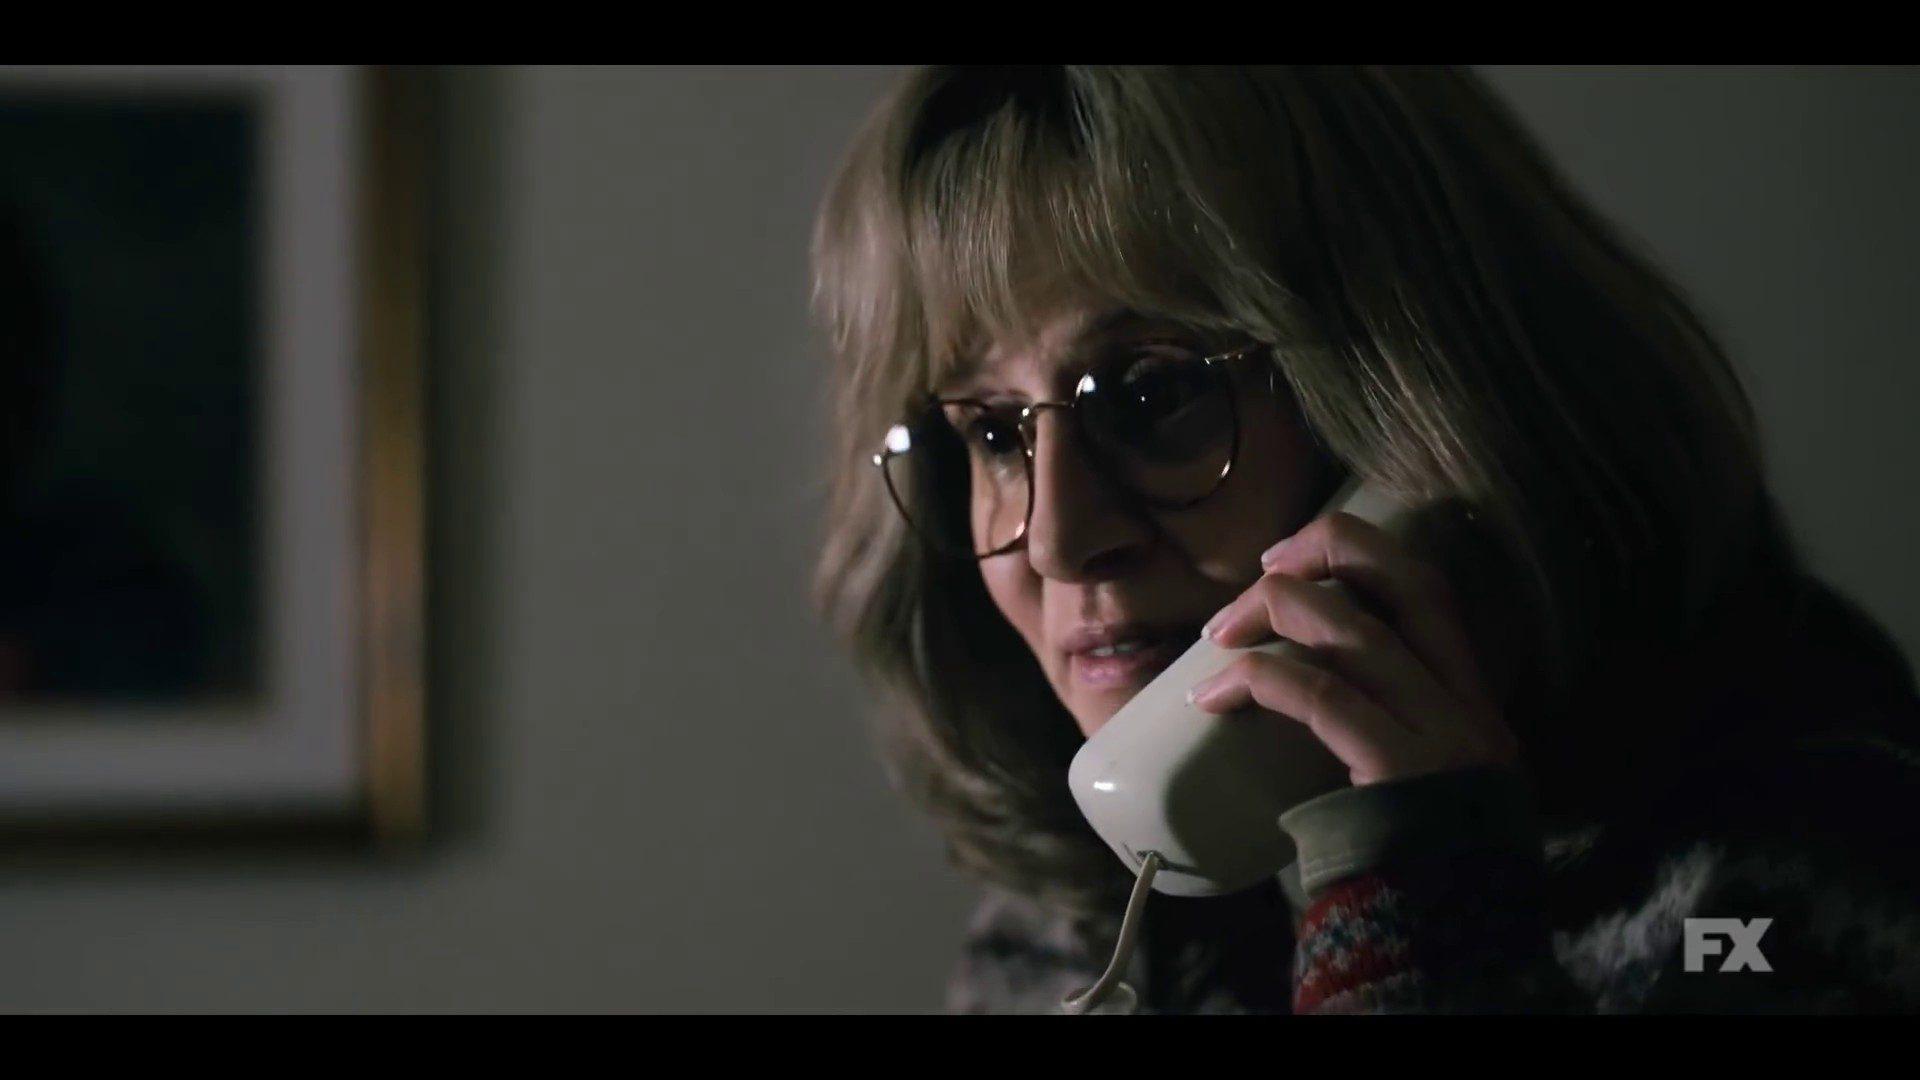 Where To Watch American Crime Story Season 3?